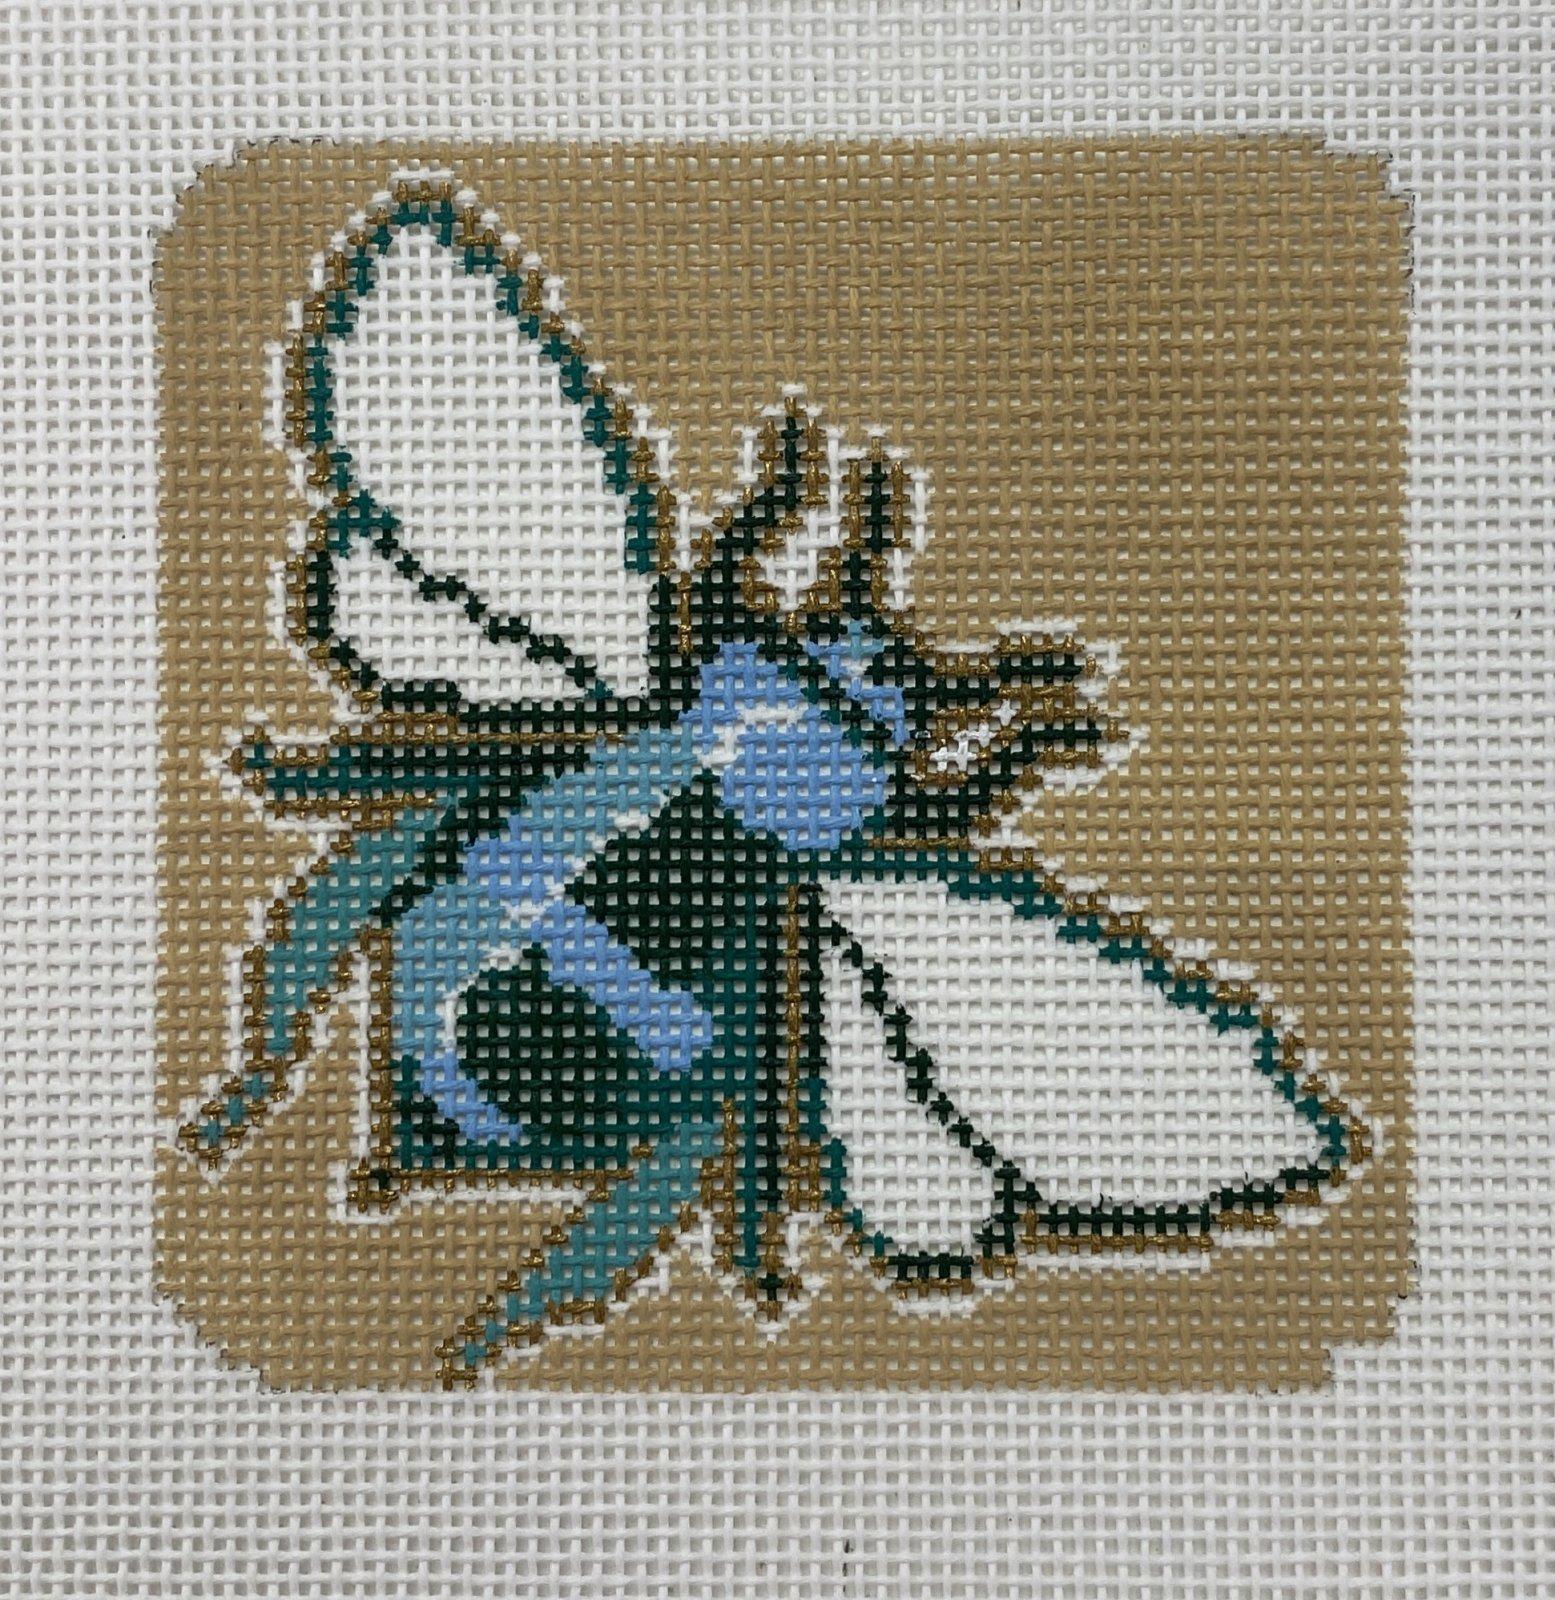 Bee,18 ct.,3.25x3.25